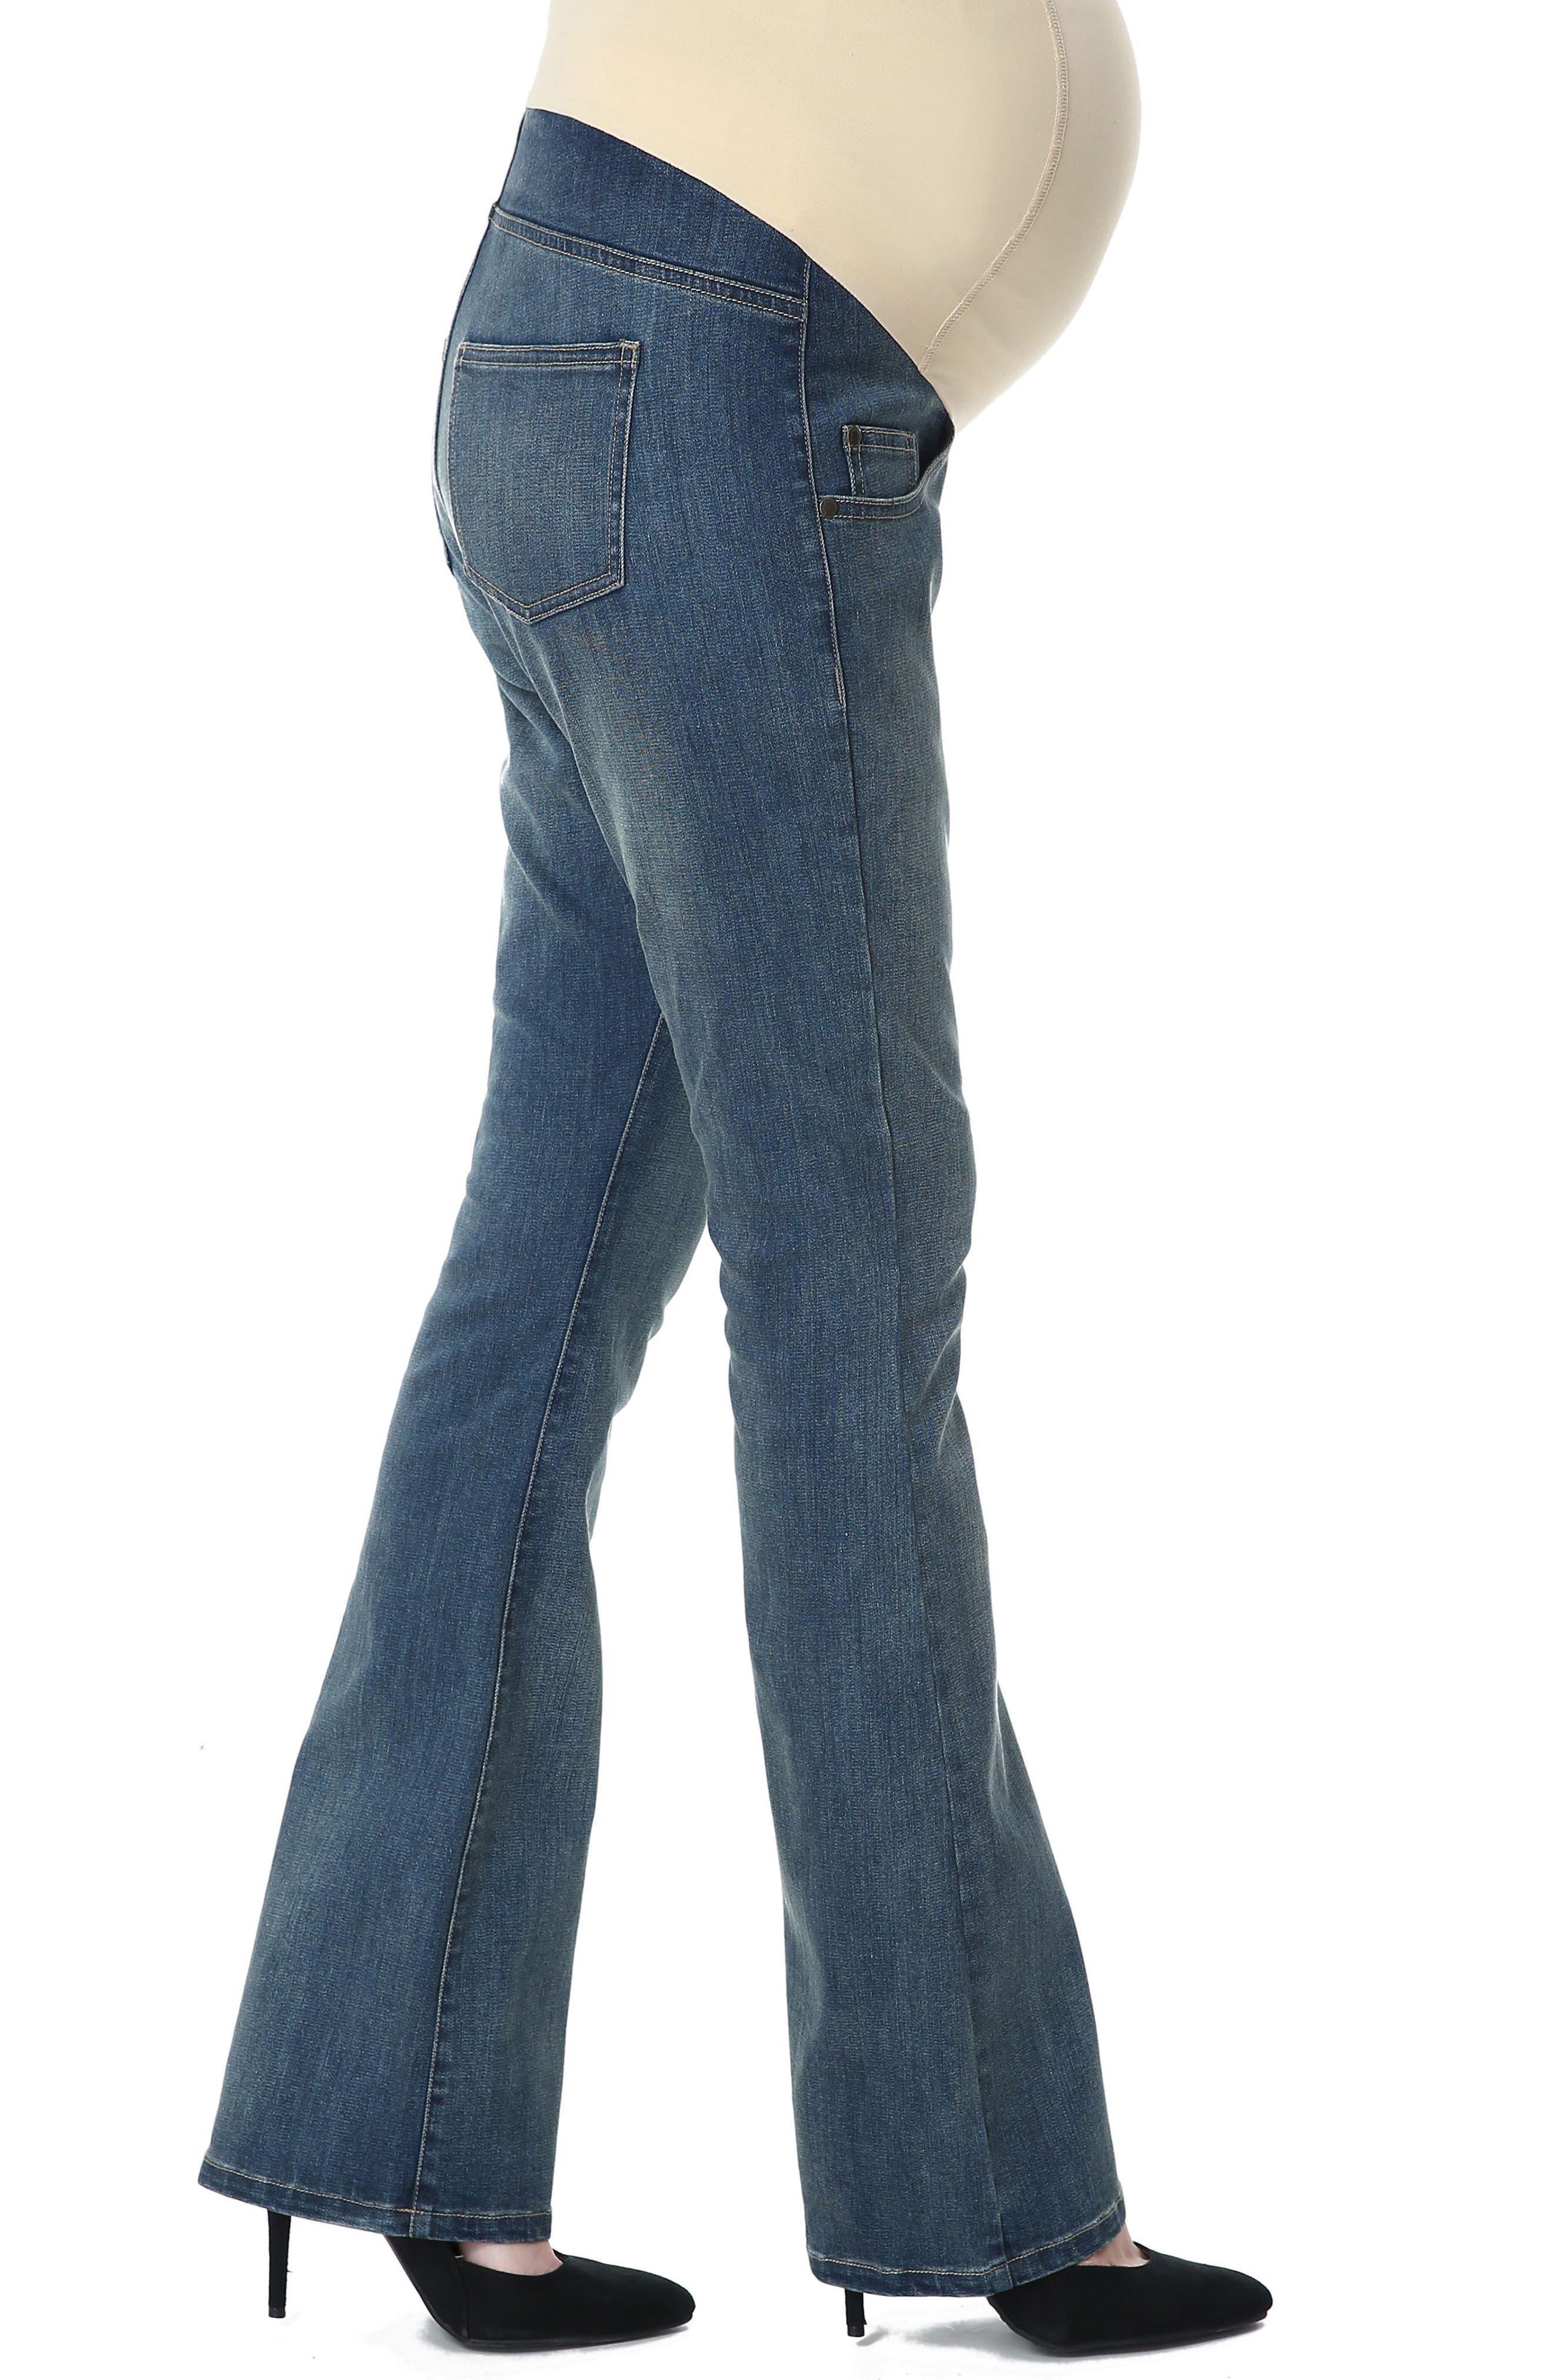 Dixie Maternity Flare Jeans,                             Alternate thumbnail 4, color,                             Medium Indigo